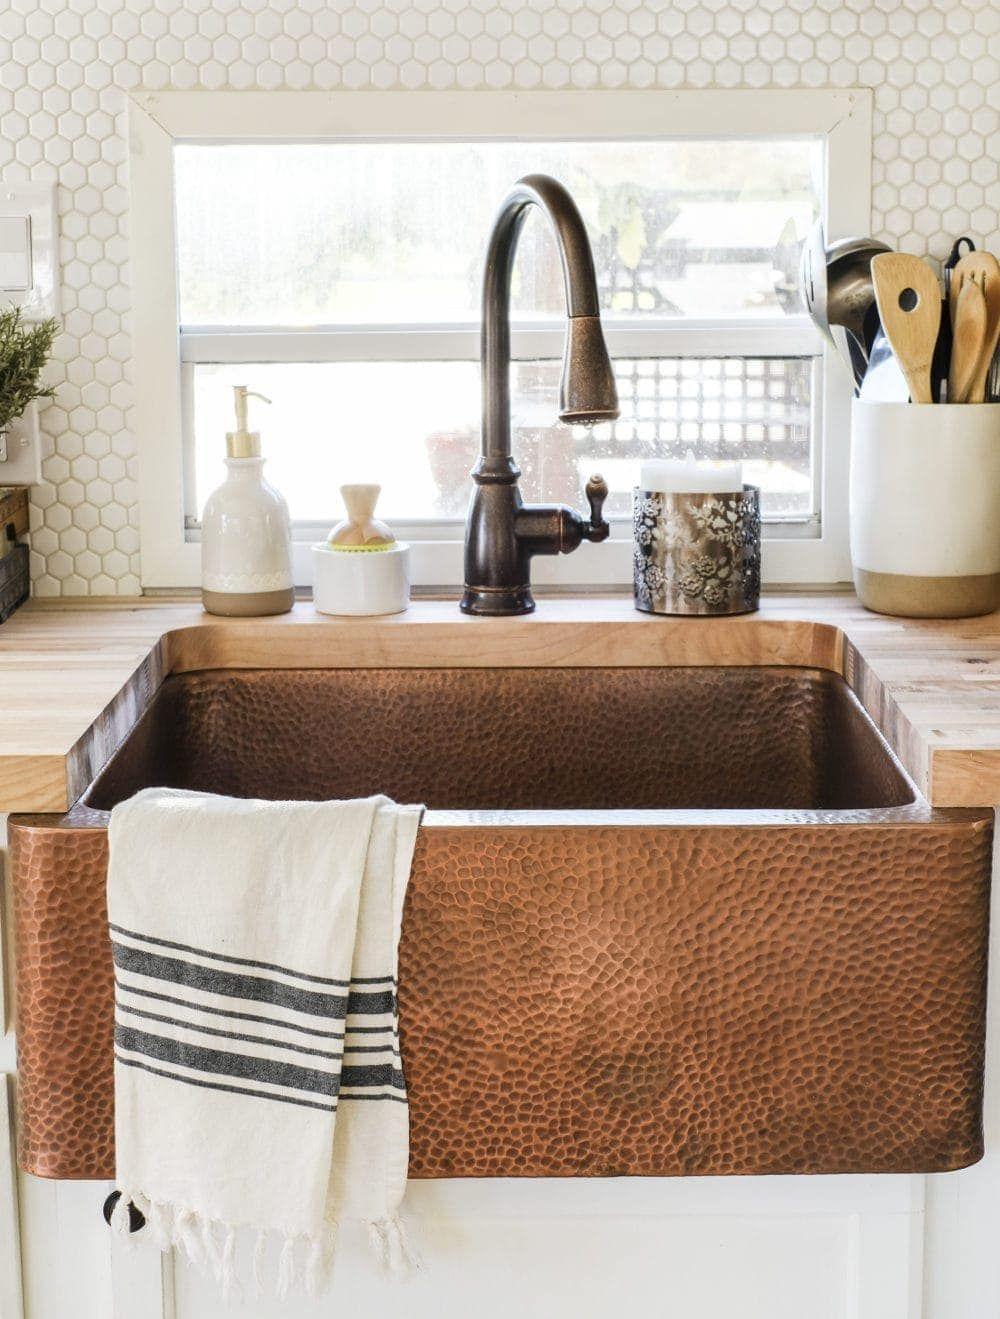 10x10 Grow Room Design: Rv Kitchen Remodel, Rv Makeover